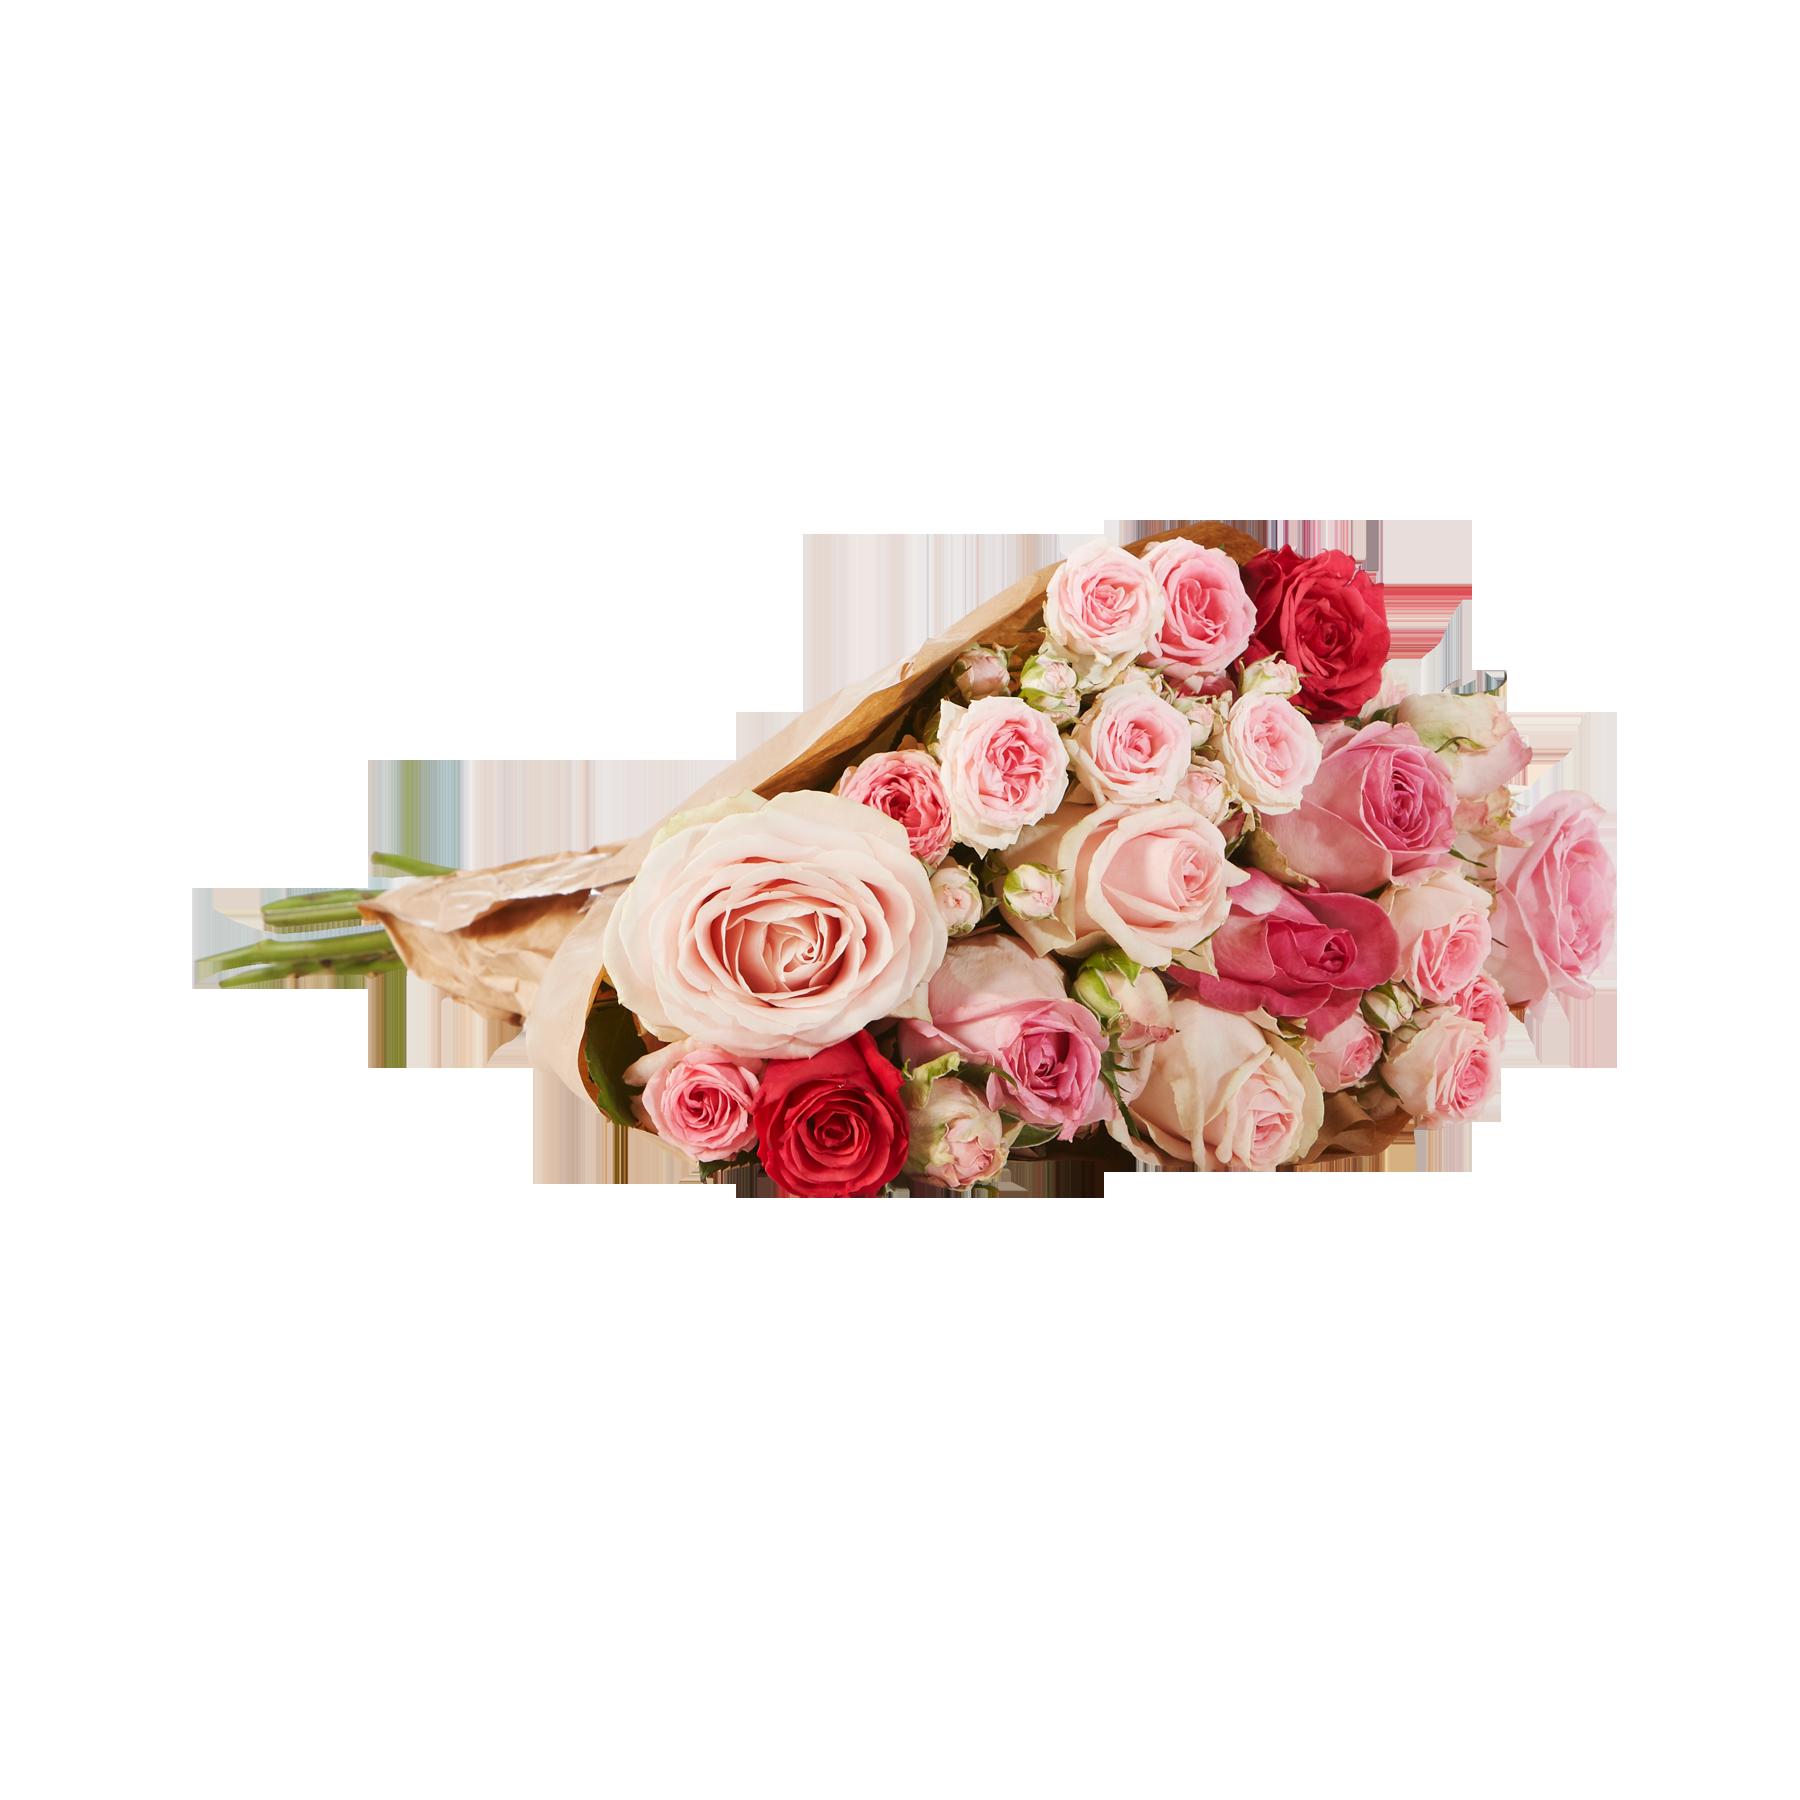 #10 Stiele Mellow Roses Größe M#